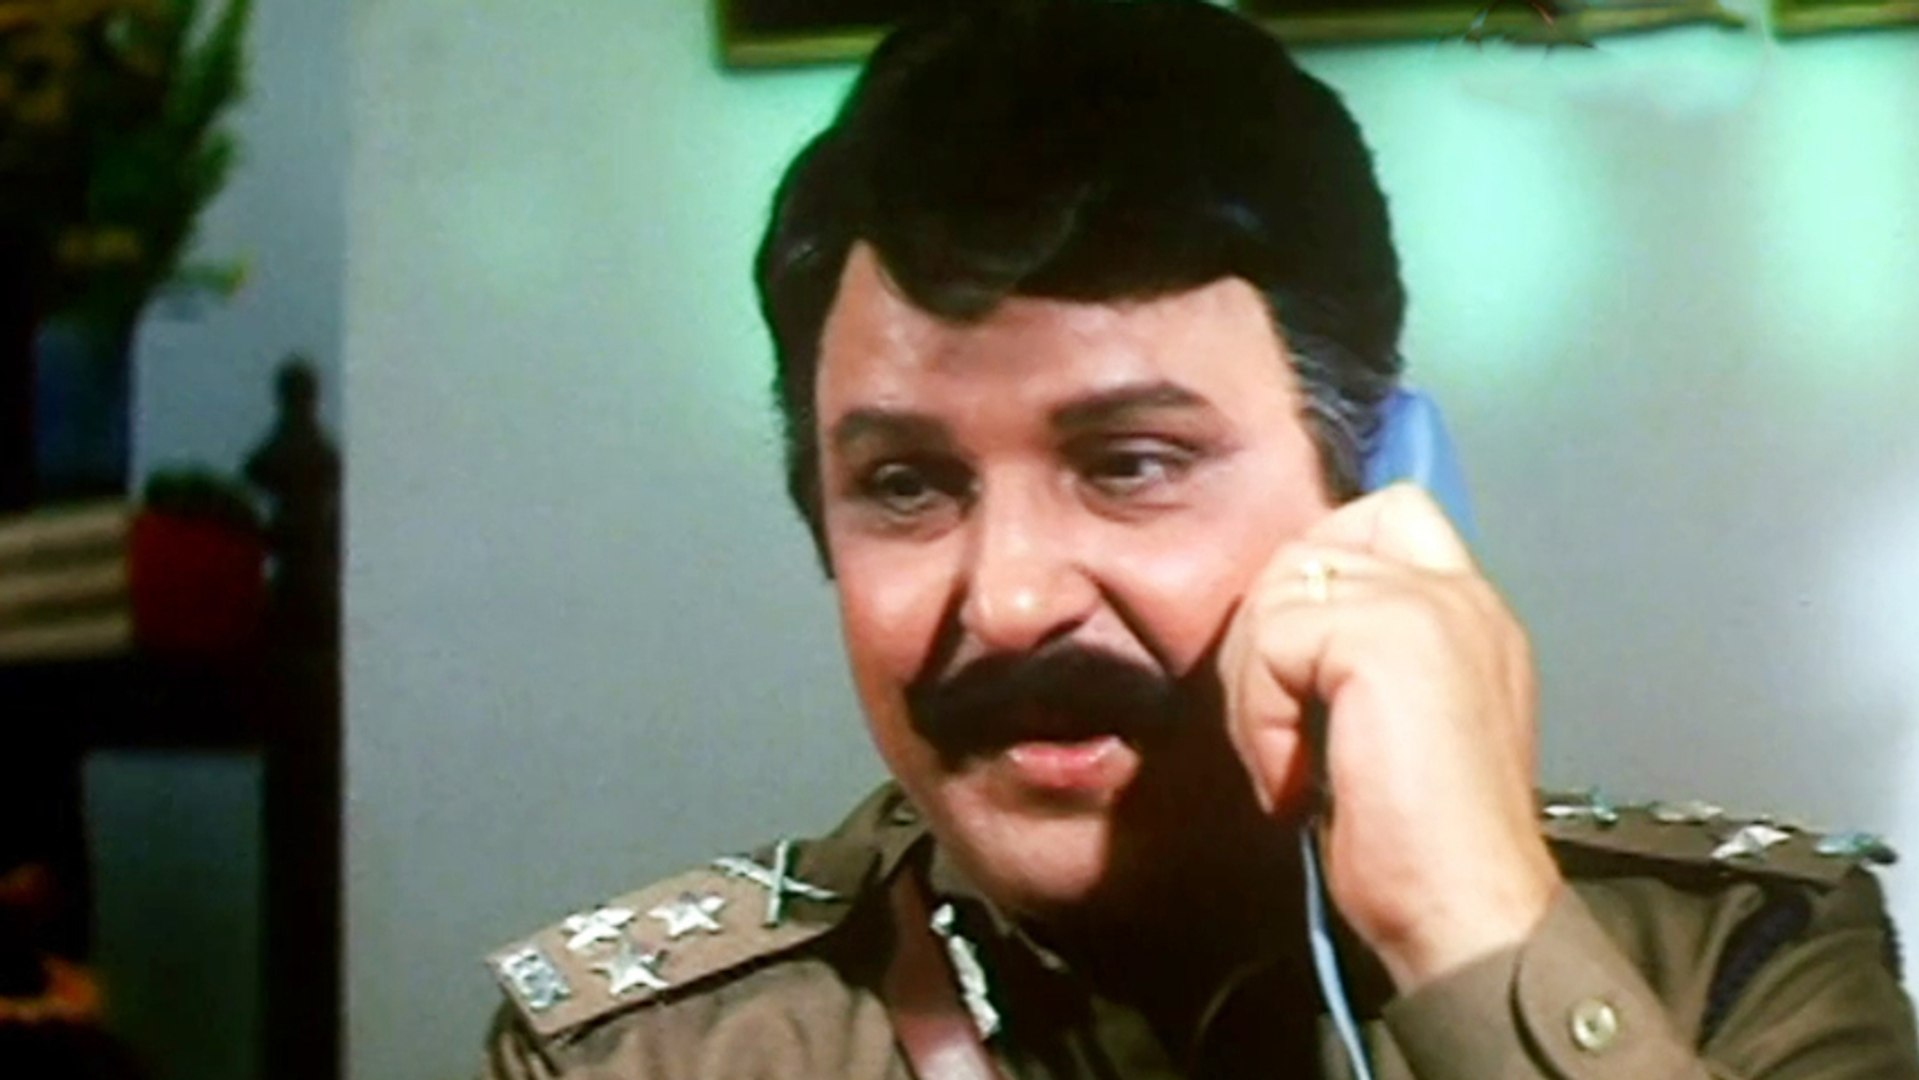 Gudachari No 1 [Arjun] Movie Part-03 - Sarath Babu Phone Call to His Daughter Simran - Arjun, Simran